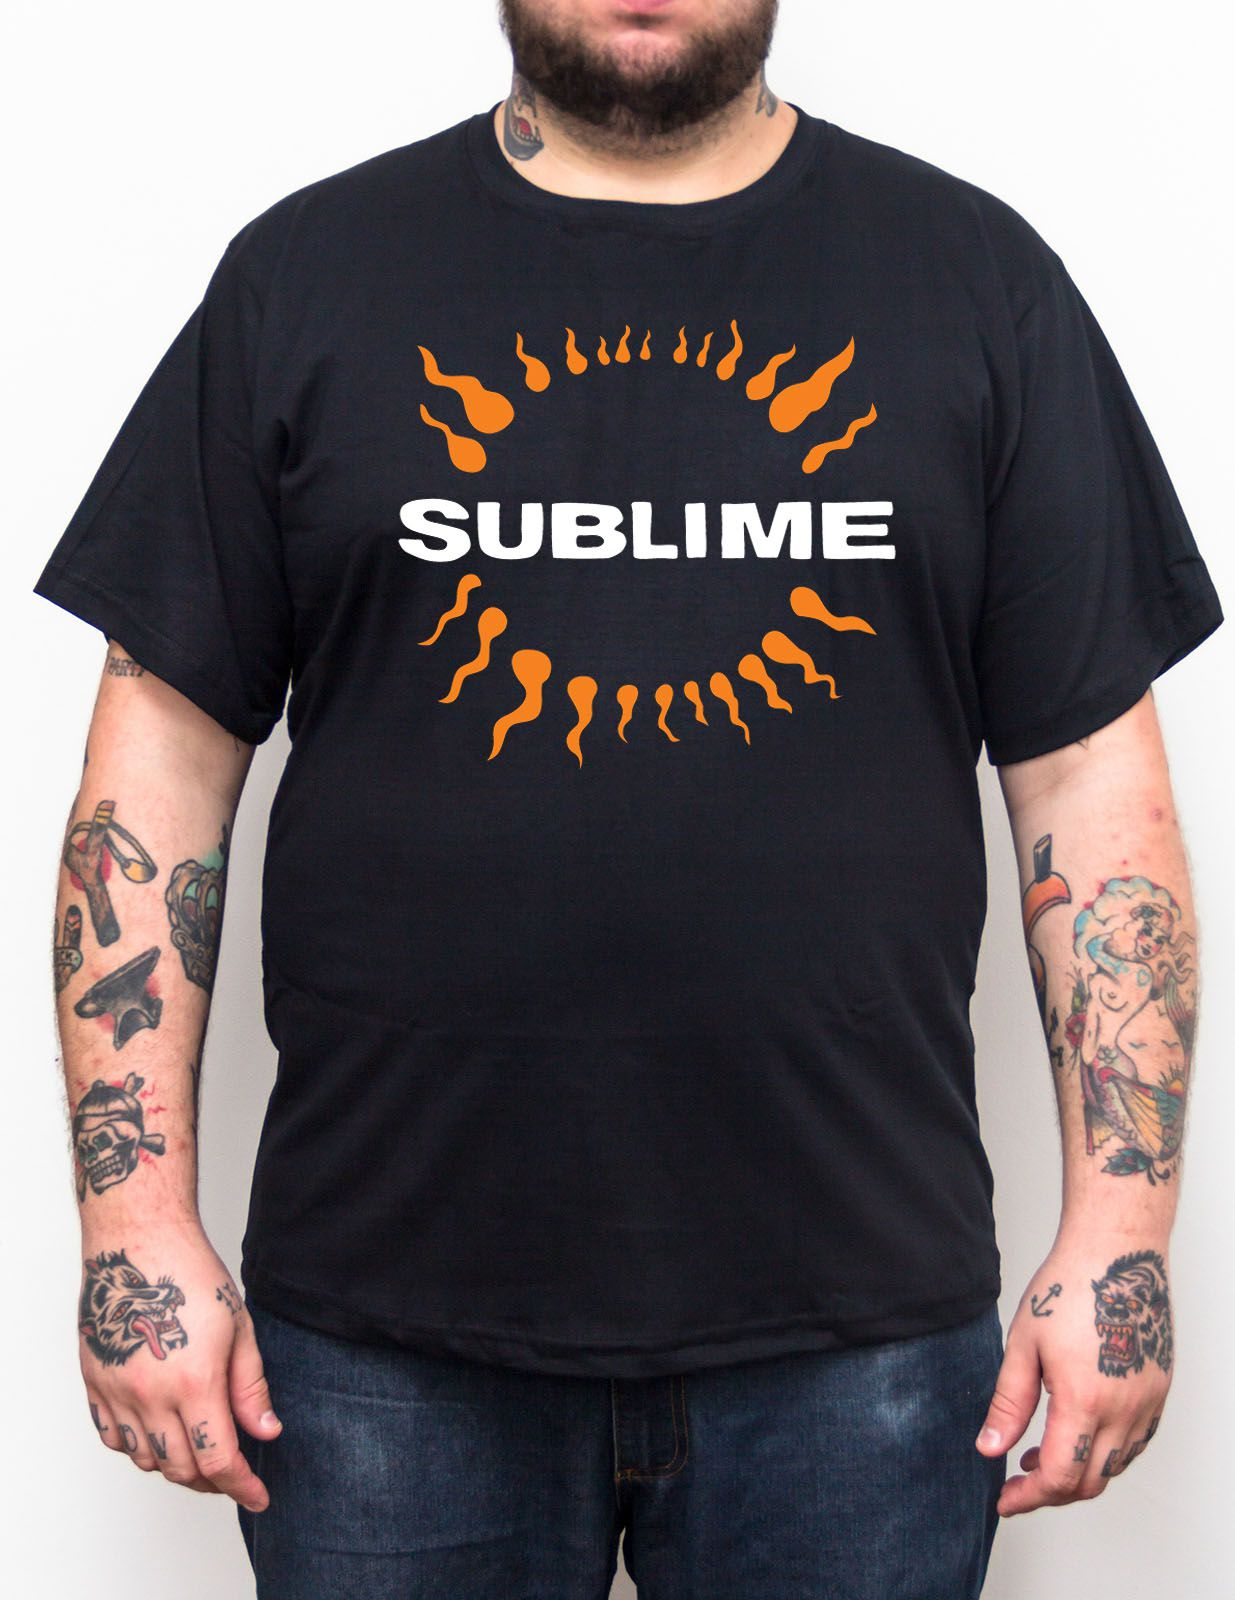 Camiseta Sublime - Preto - Plus Size - Tamanho Grande Xg  - HShop